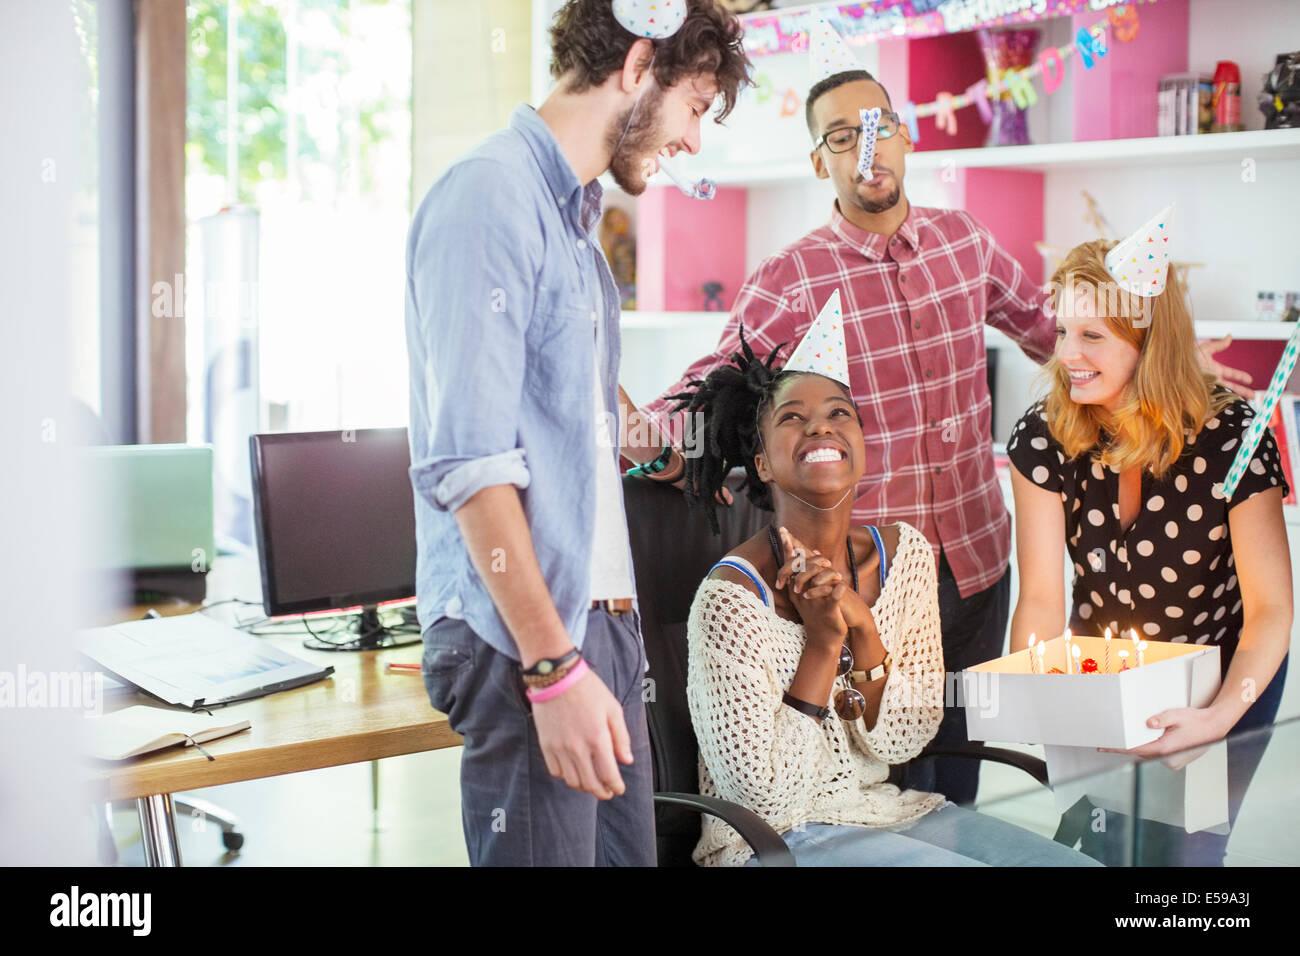 Leute feiern Geburtstag im Büro Stockbild